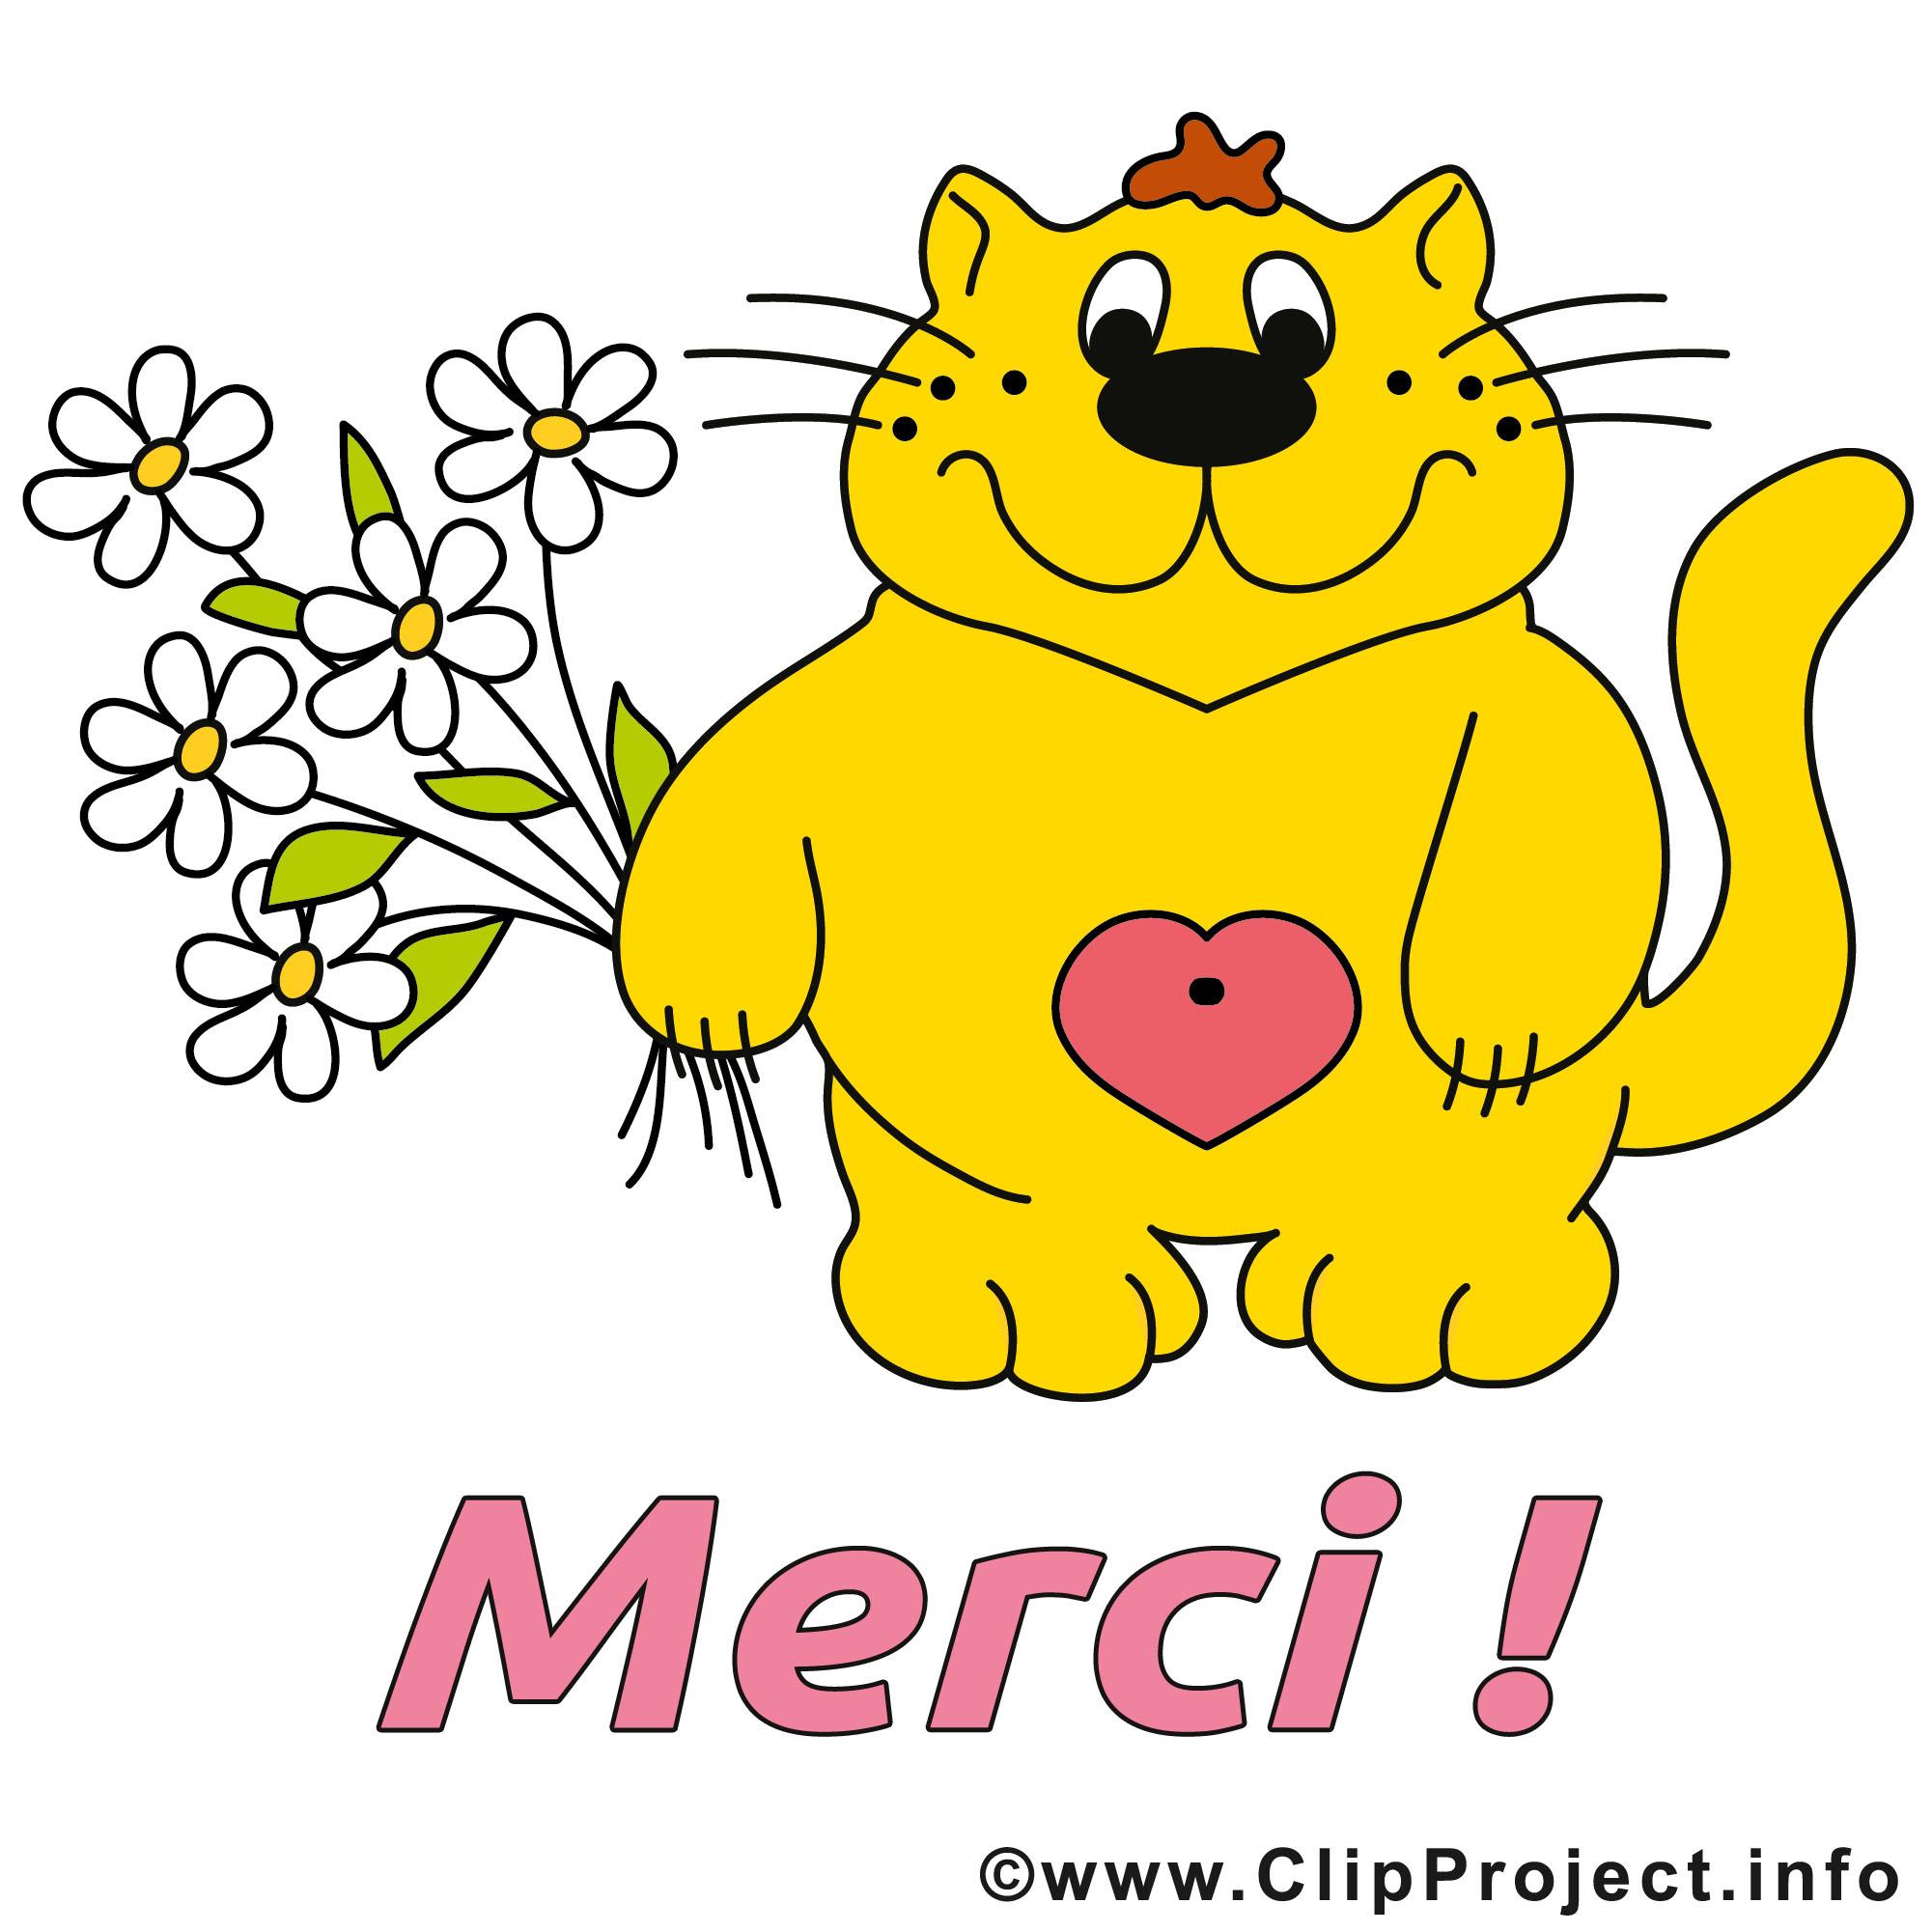 Chat dessin - Merci clip arts gratuits - Merci dessin ...